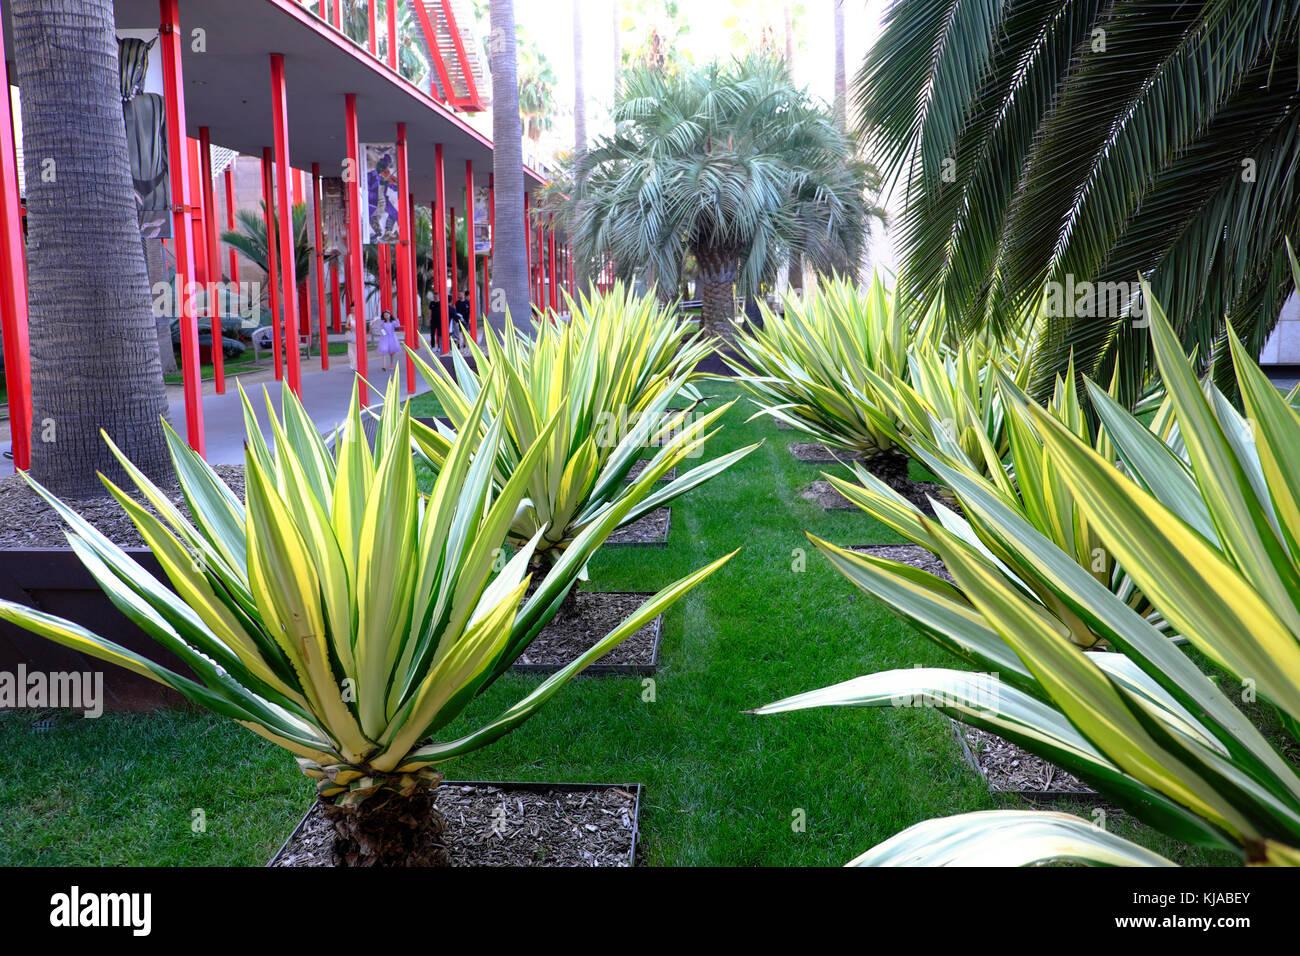 Yucca Pflanzen im LACMA Palm Garden neben Gehweg zu Broad Contemporary Art Museum, Wilshire Blvd Miracle Mile Los Stockfoto